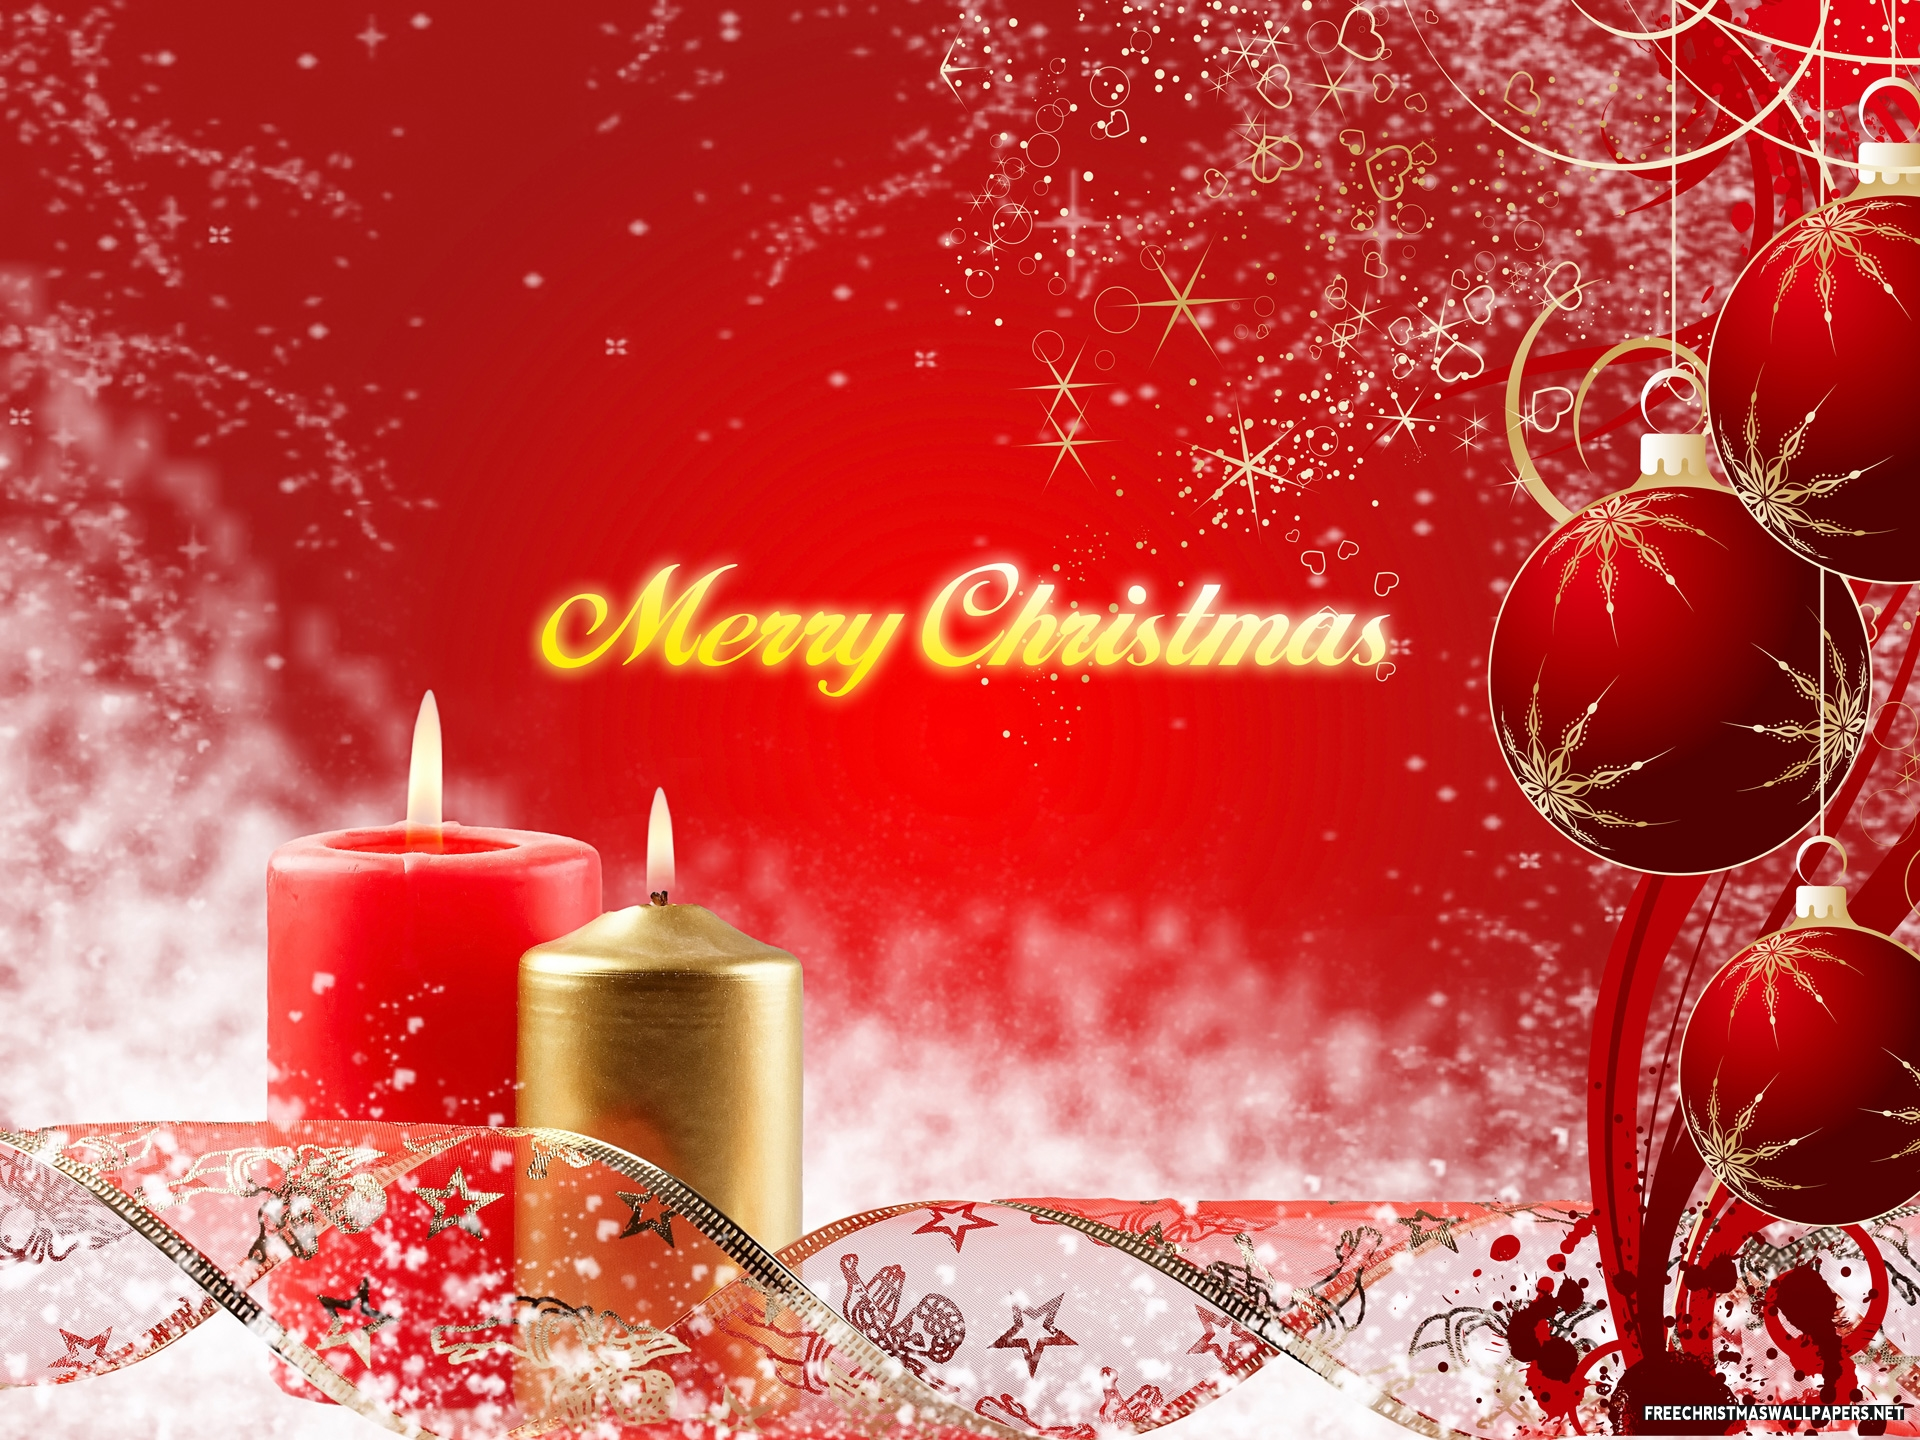 Merry Christmas to everyone   Happy True Life